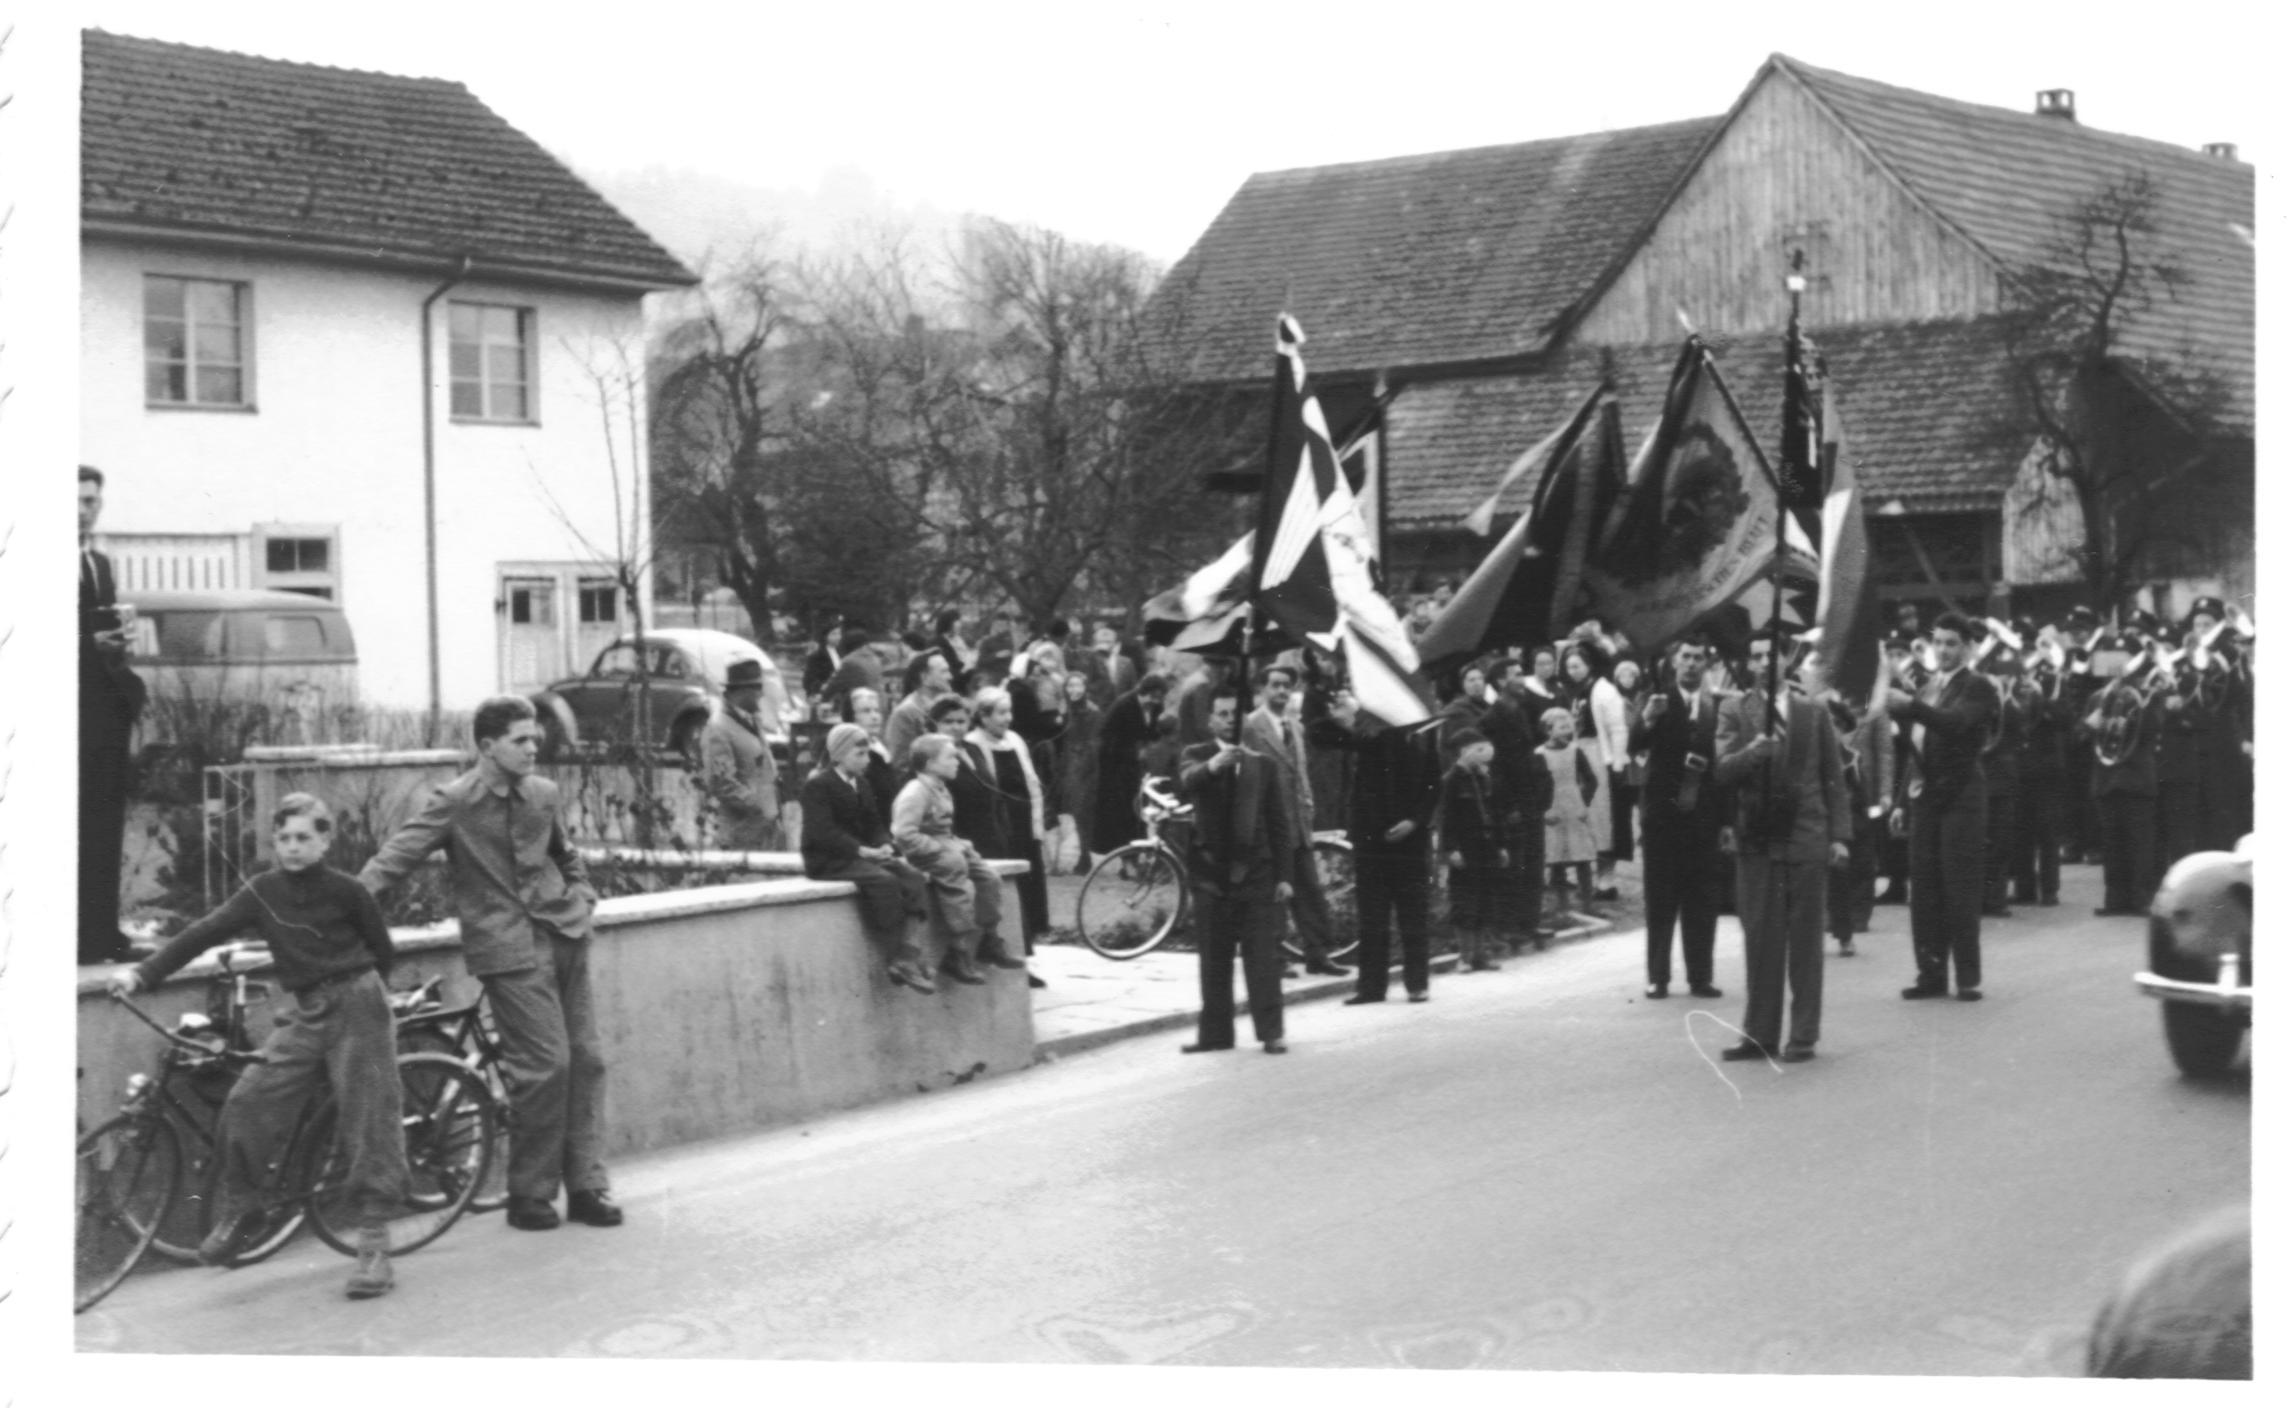 Glockeneinzug in Neuenhof